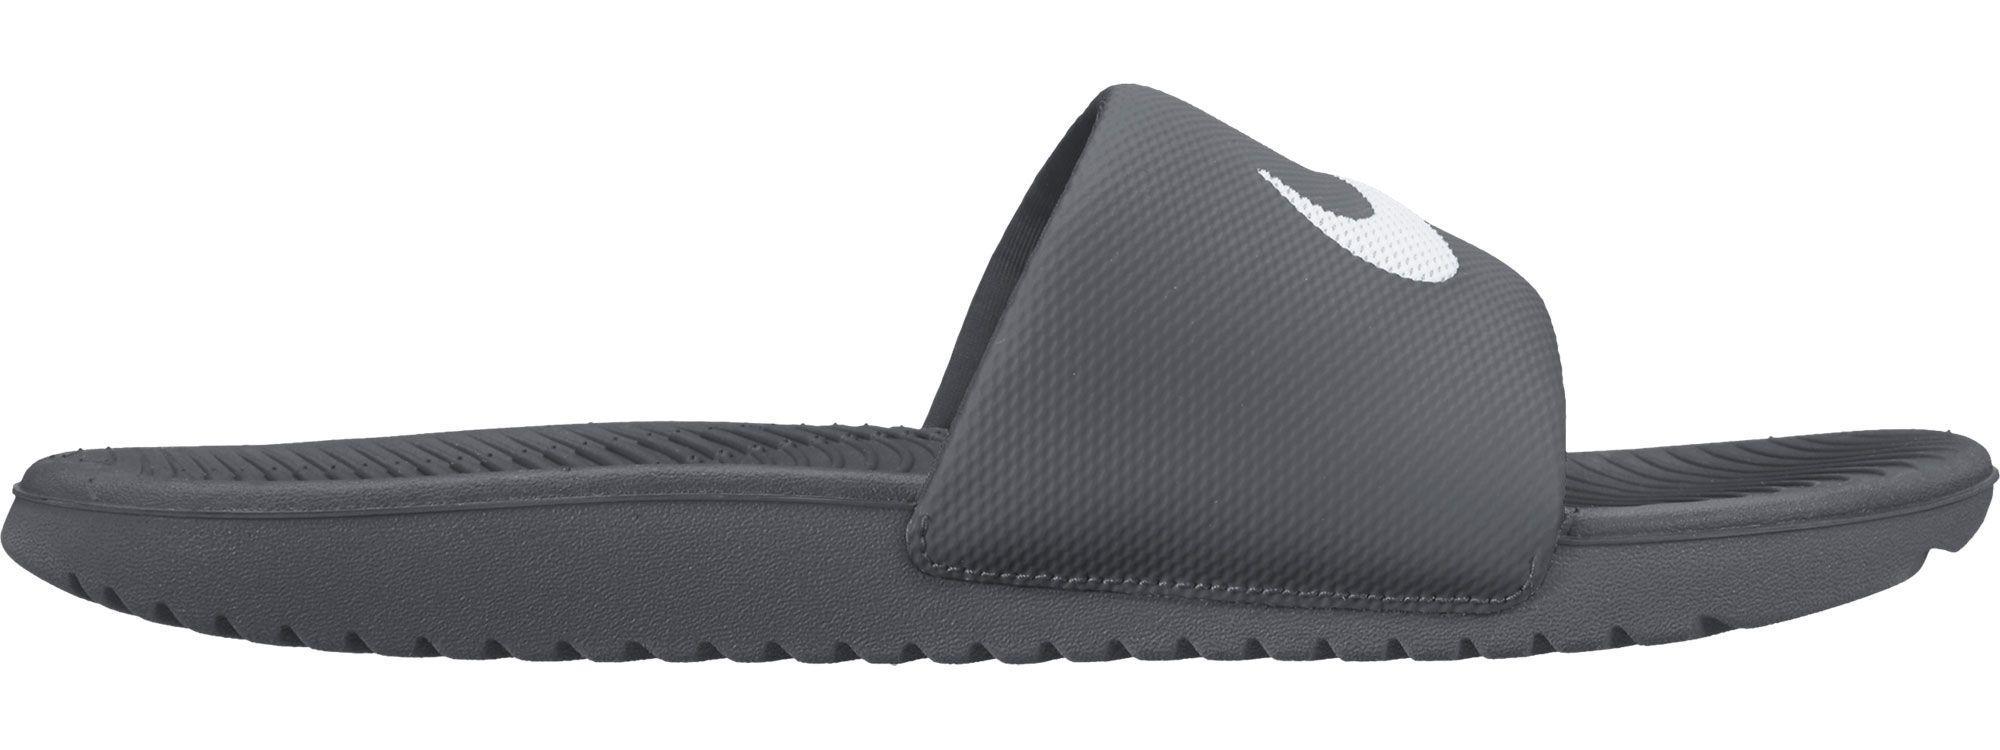 8cdfedee0 Lyst - Nike Kawa Slides in Gray for Men - Save 21%